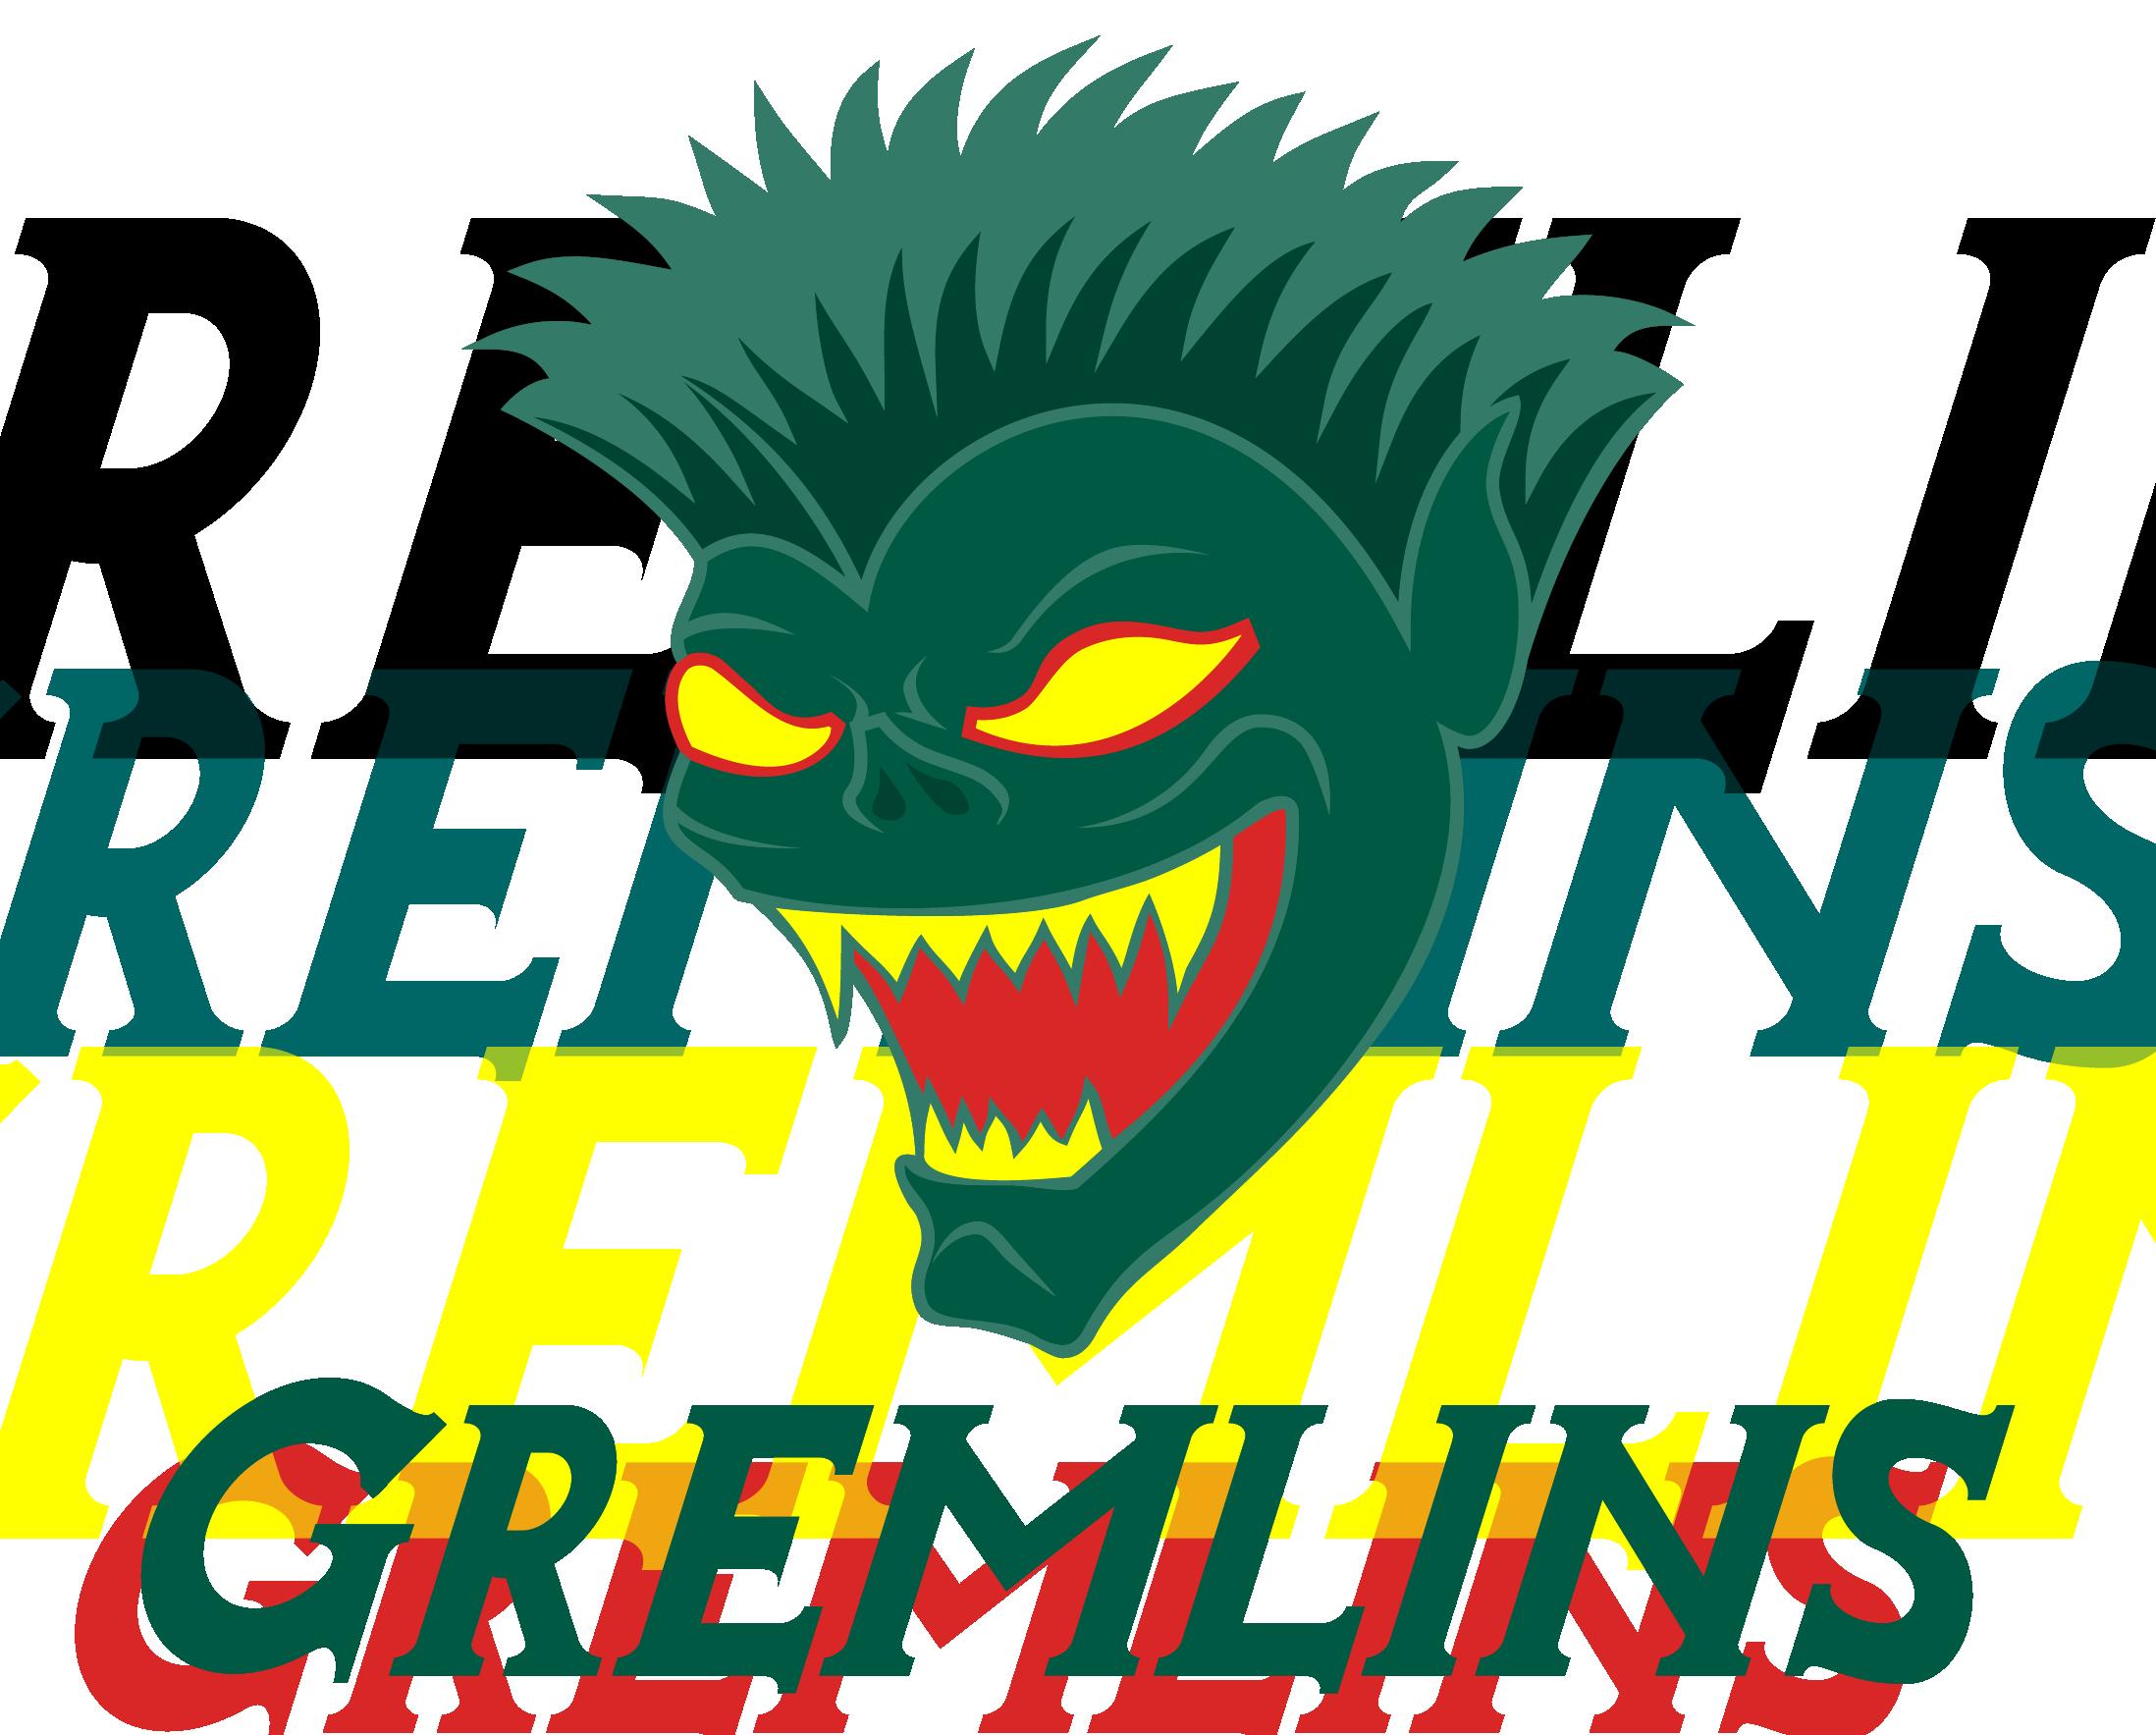 Gremlins XVII Branding